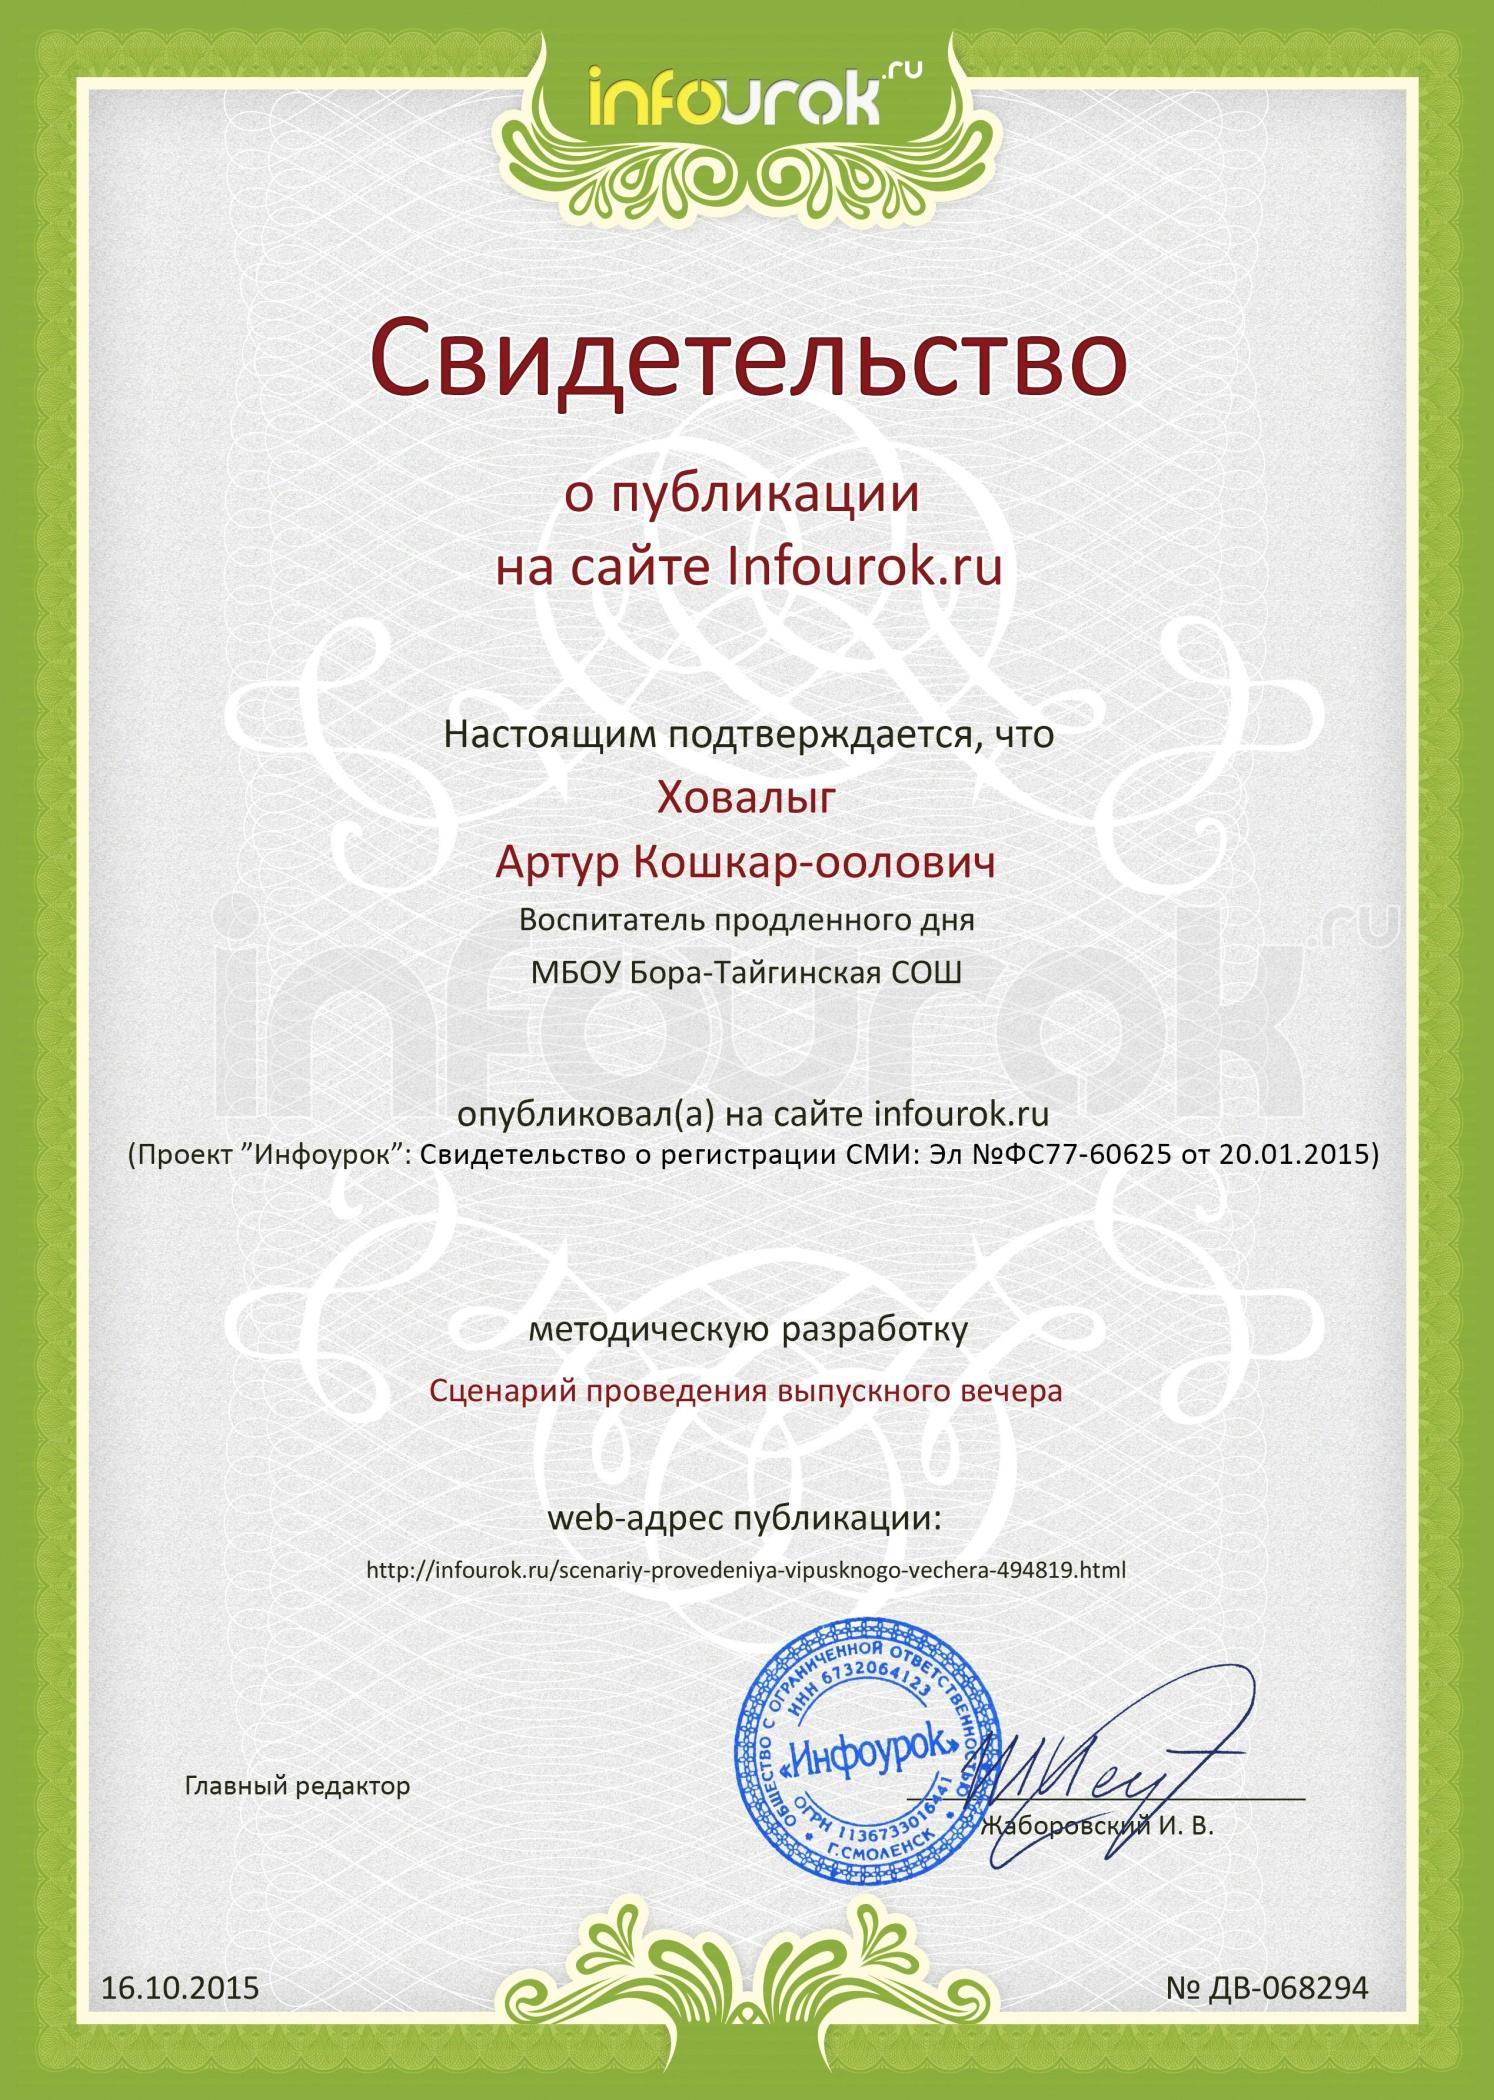 C:\Users\2015\Downloads\Сертификат проекта Infourok.ru № ДВ-068294 (1).jpg